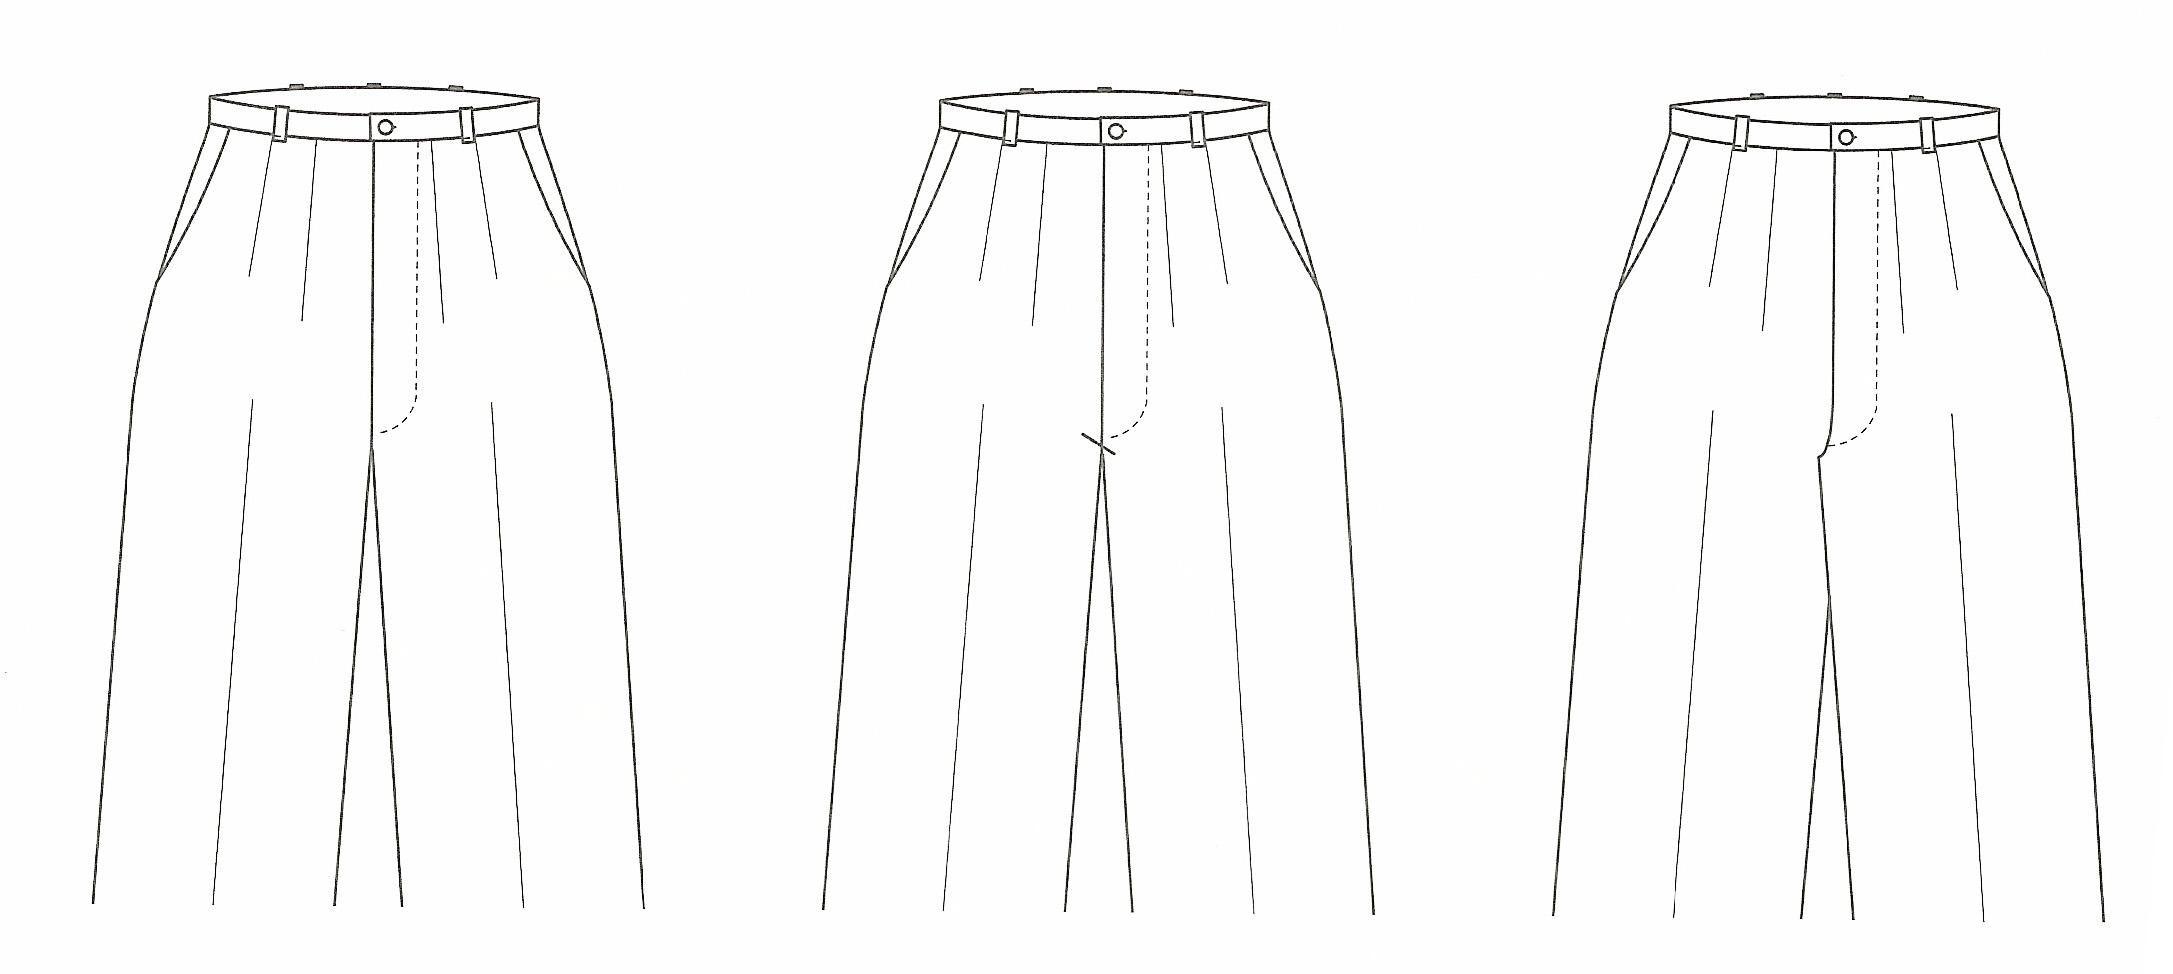 Consejos para el dibujo en plano de moda pixelnomicon for Plano de planta dibujo tecnico